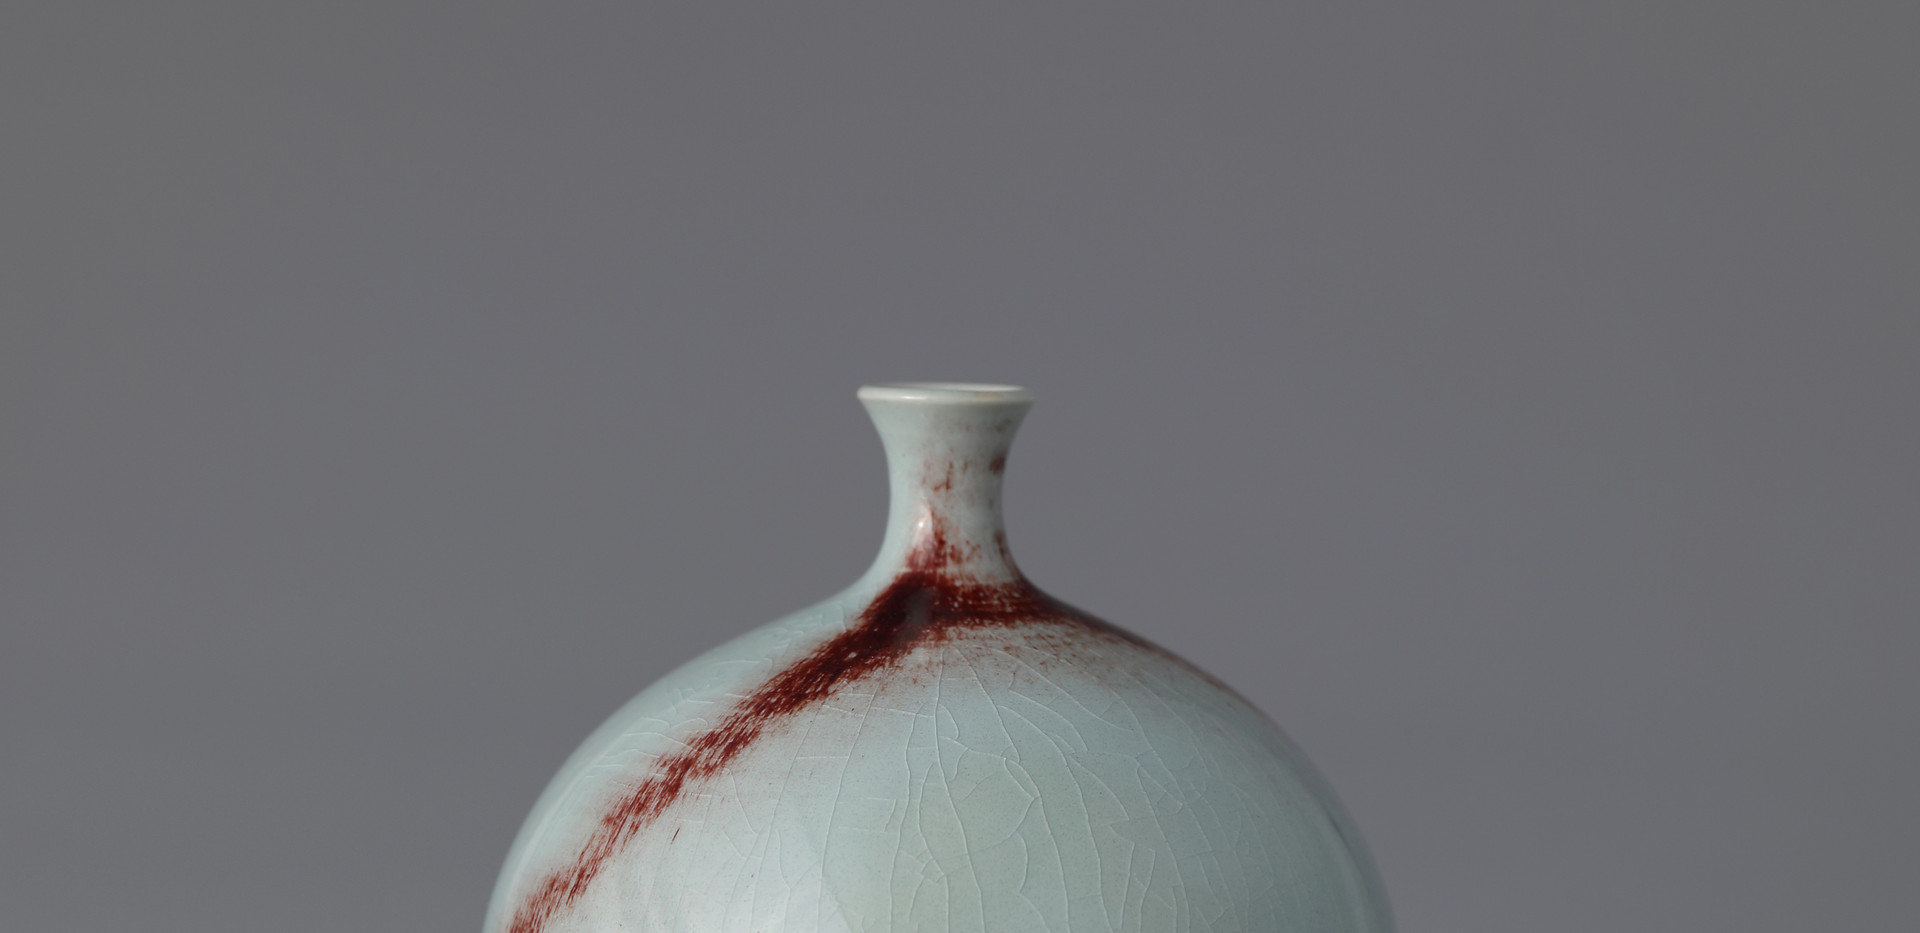 White Porcelain Vase in Underglaze Copper-Red, 2020